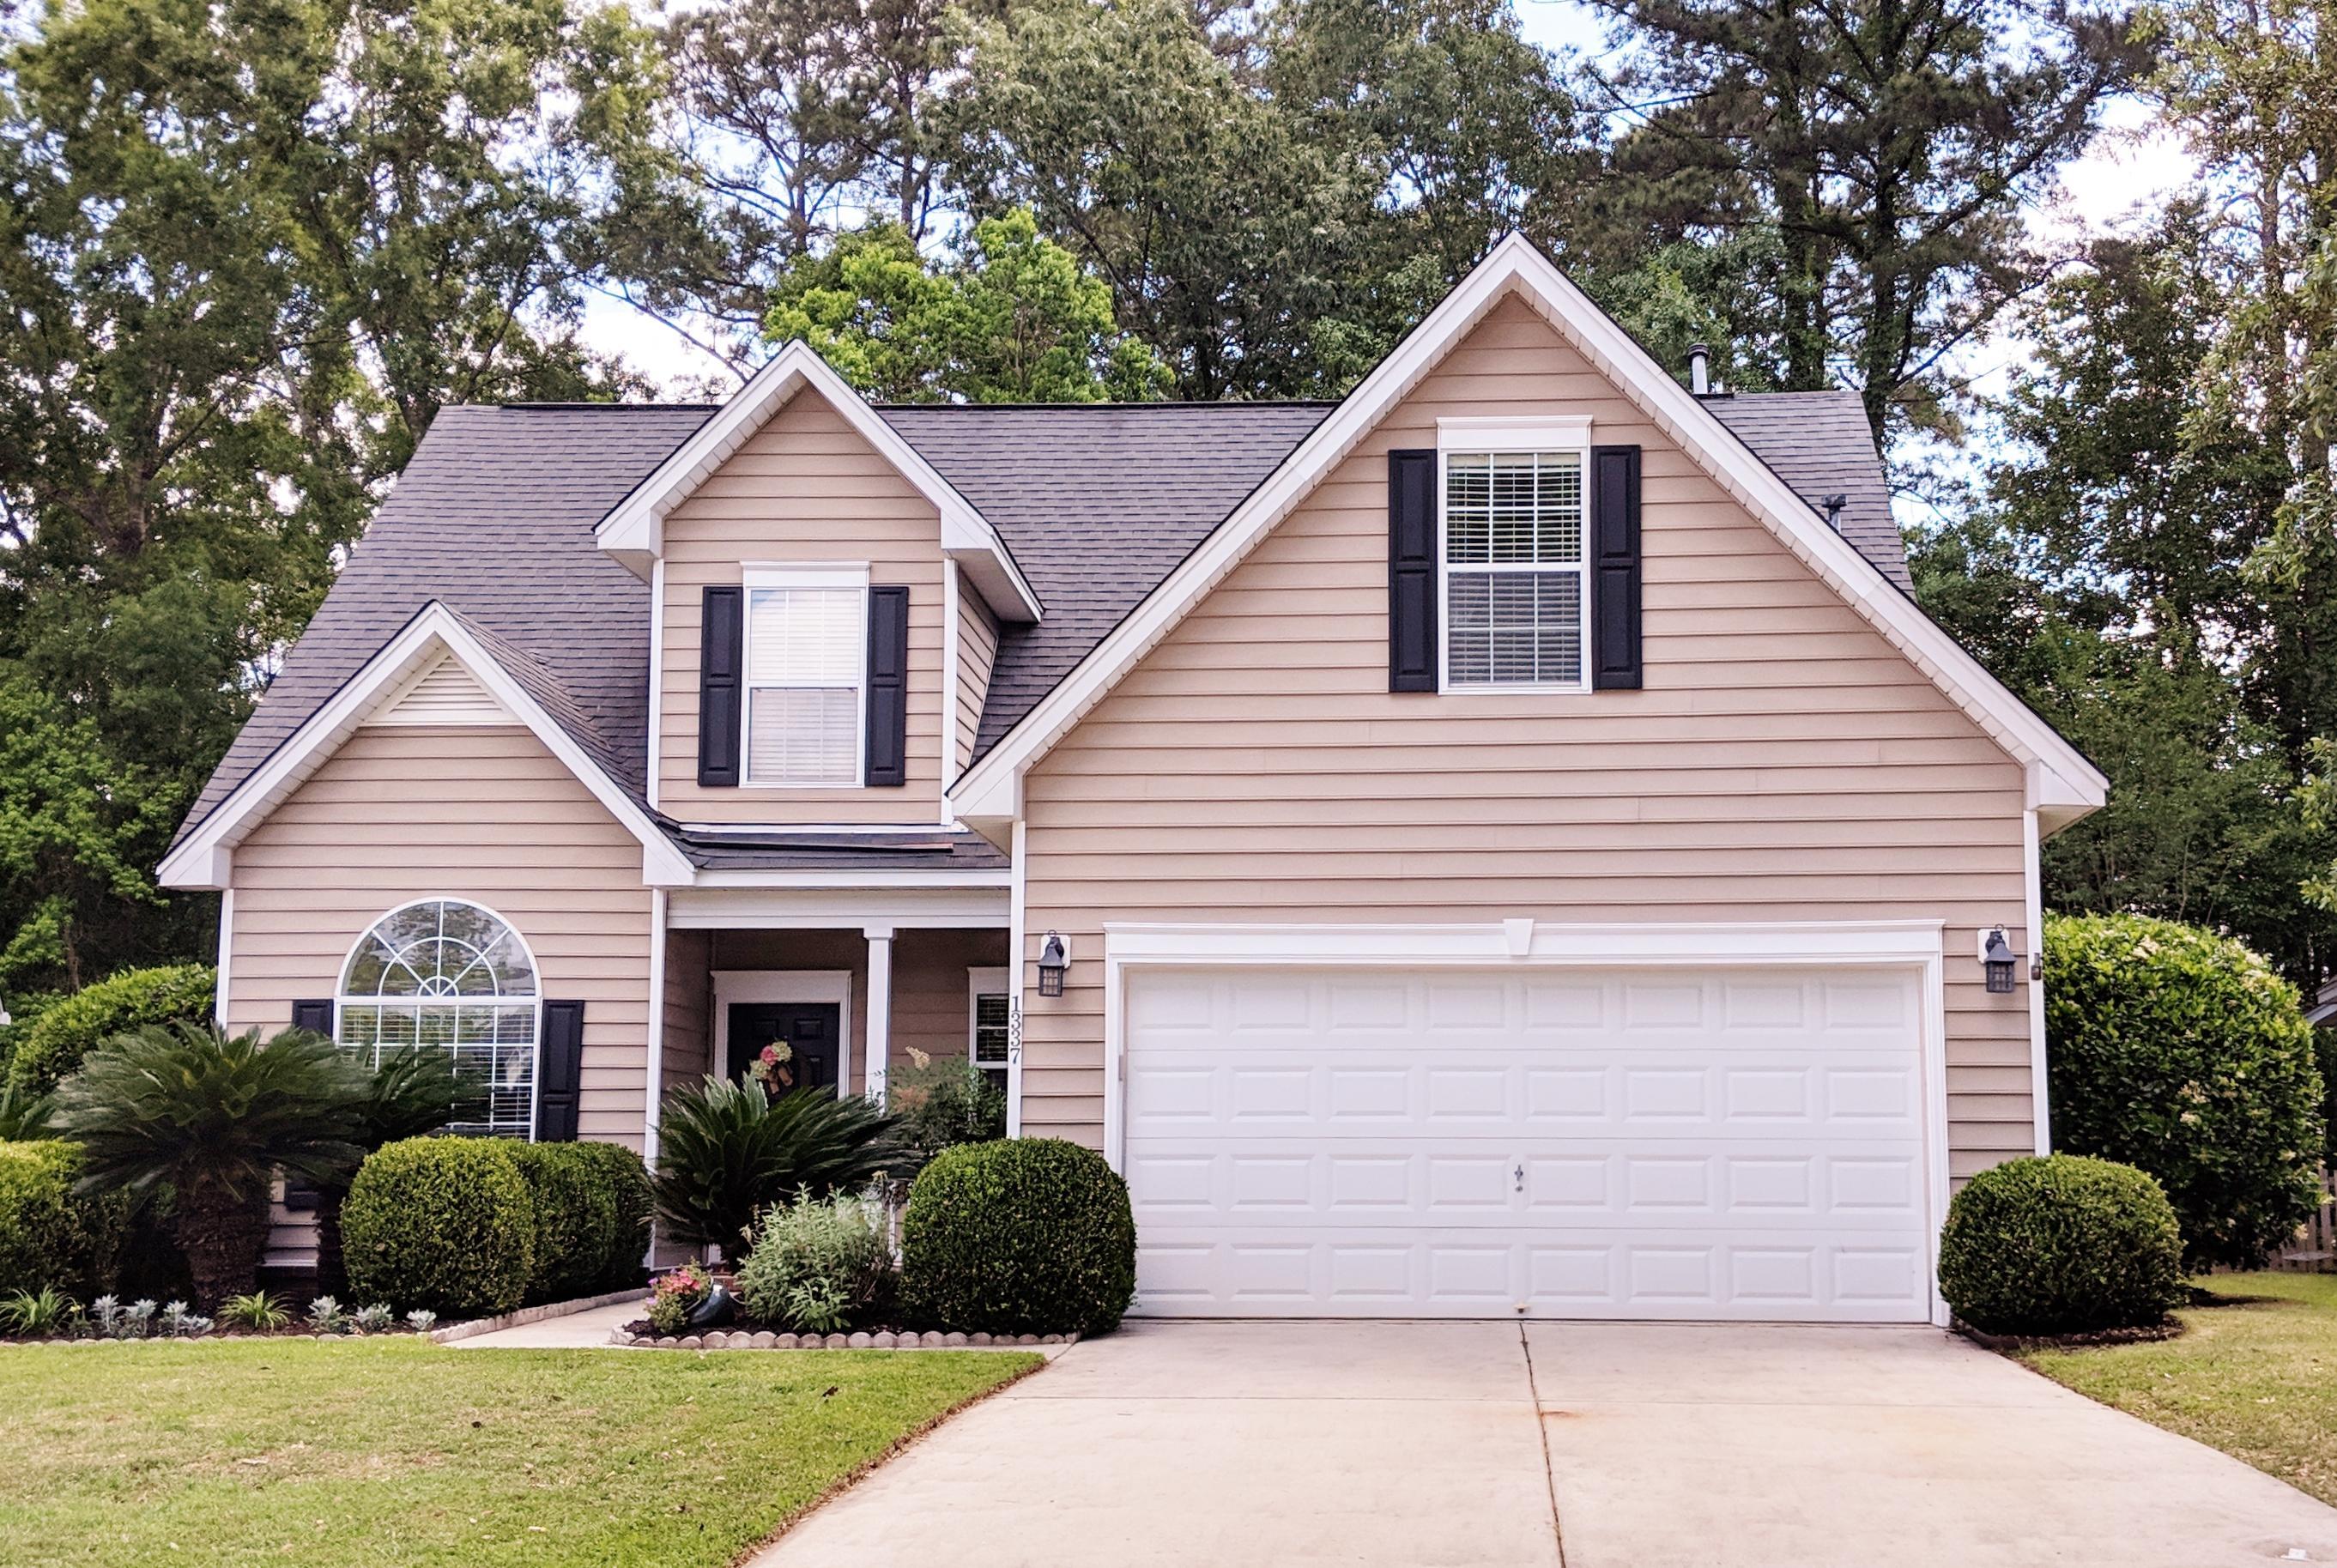 Park West Homes For Sale - 1337 Heidiho, Mount Pleasant, SC - 36